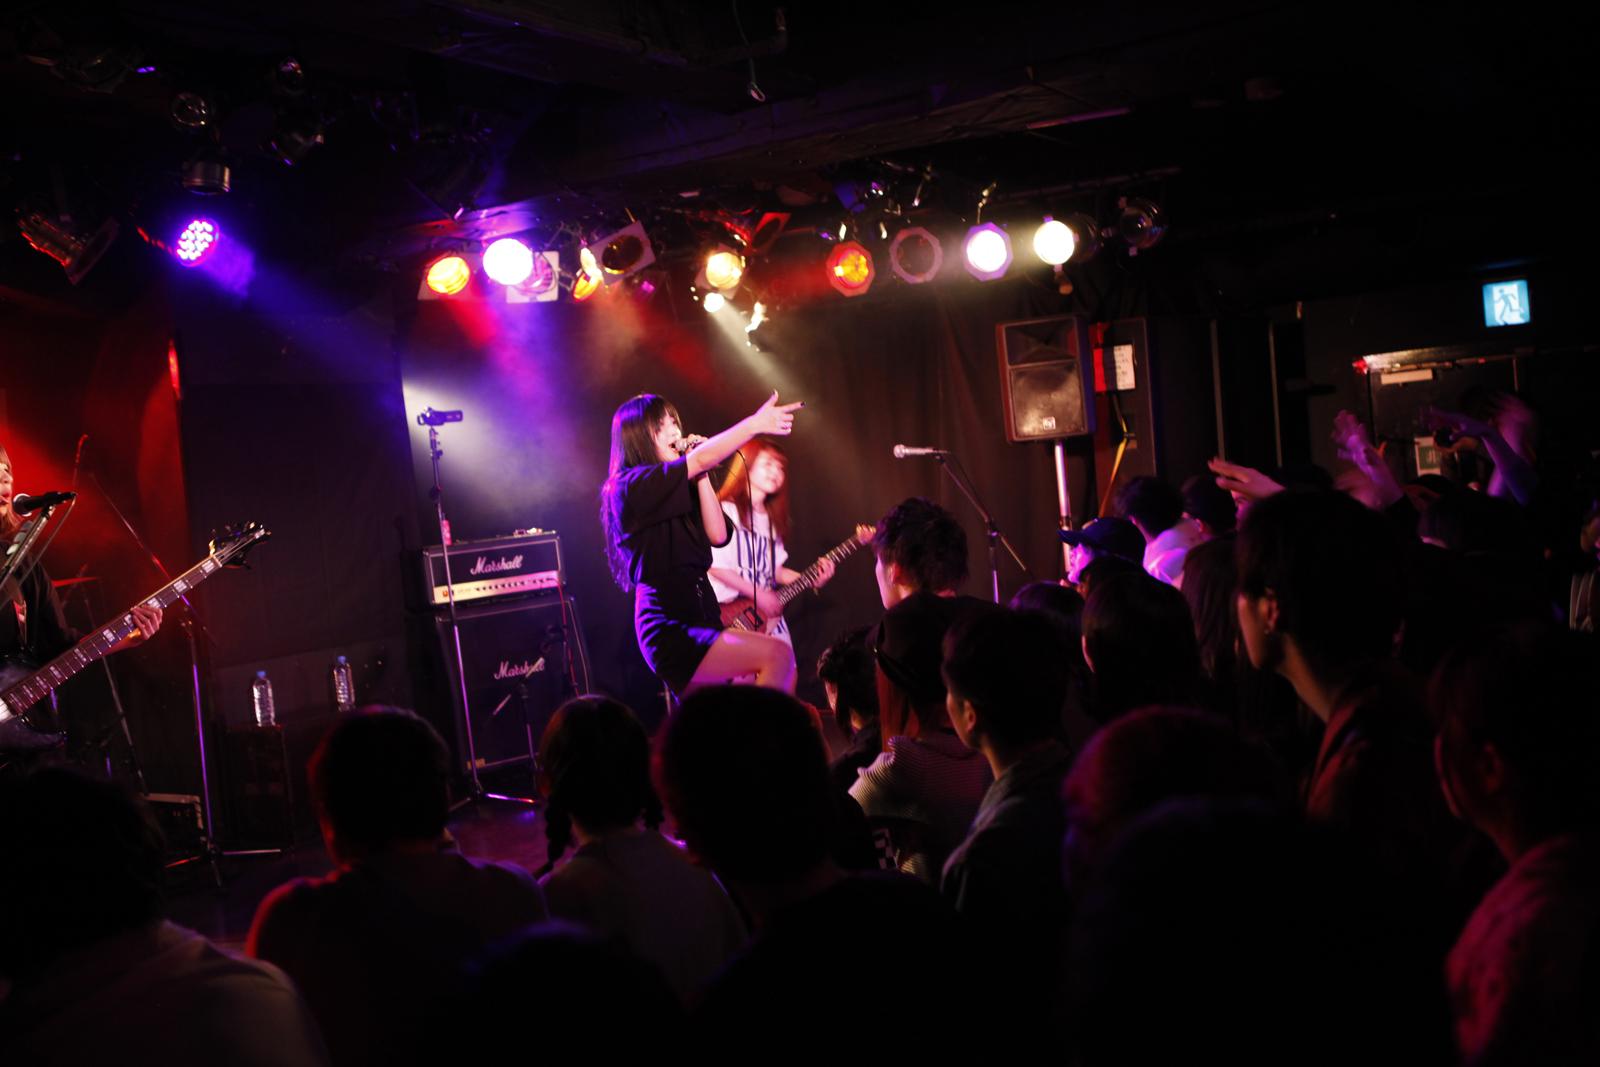 RMMS-BRATS-Live-Inn-Rosa-20170329-18